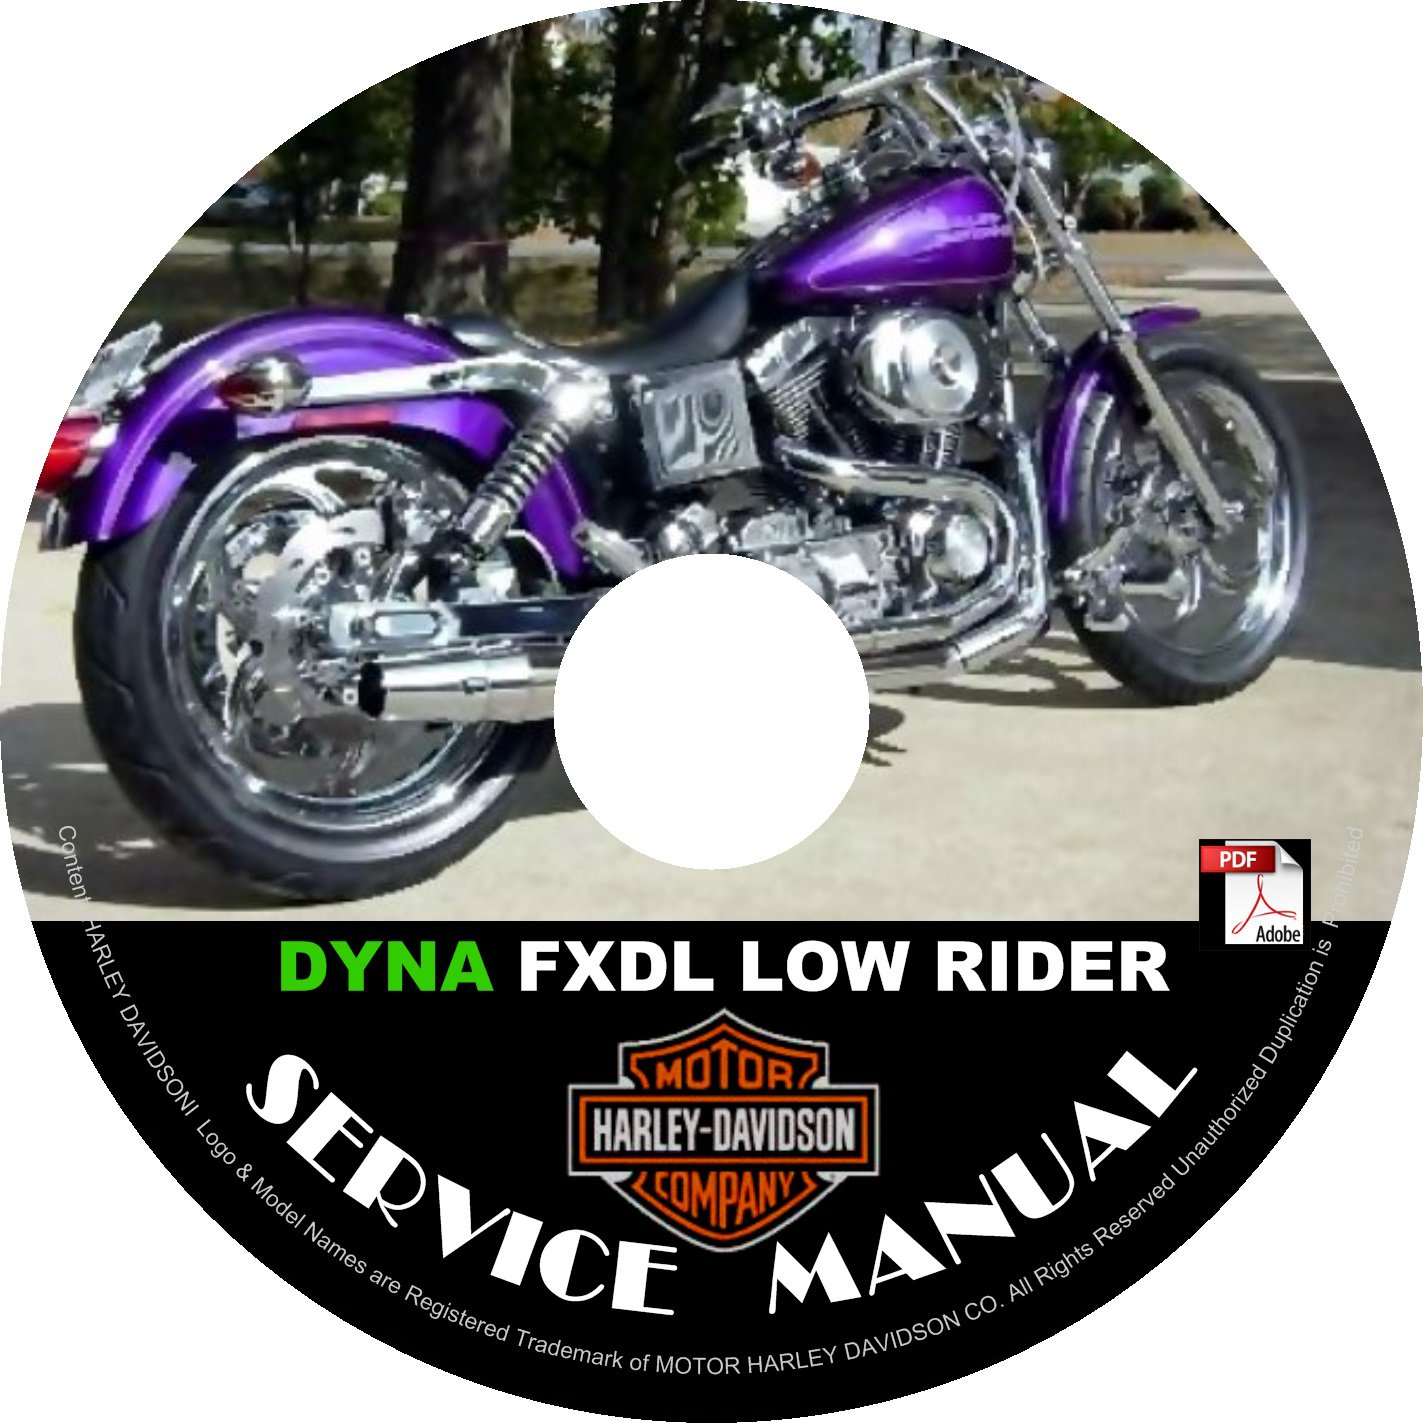 1999 Harley Davidson FXDL Dyna Low Rider Service Repair Shop Manual on CD Fix Rebuild '99 Workshop